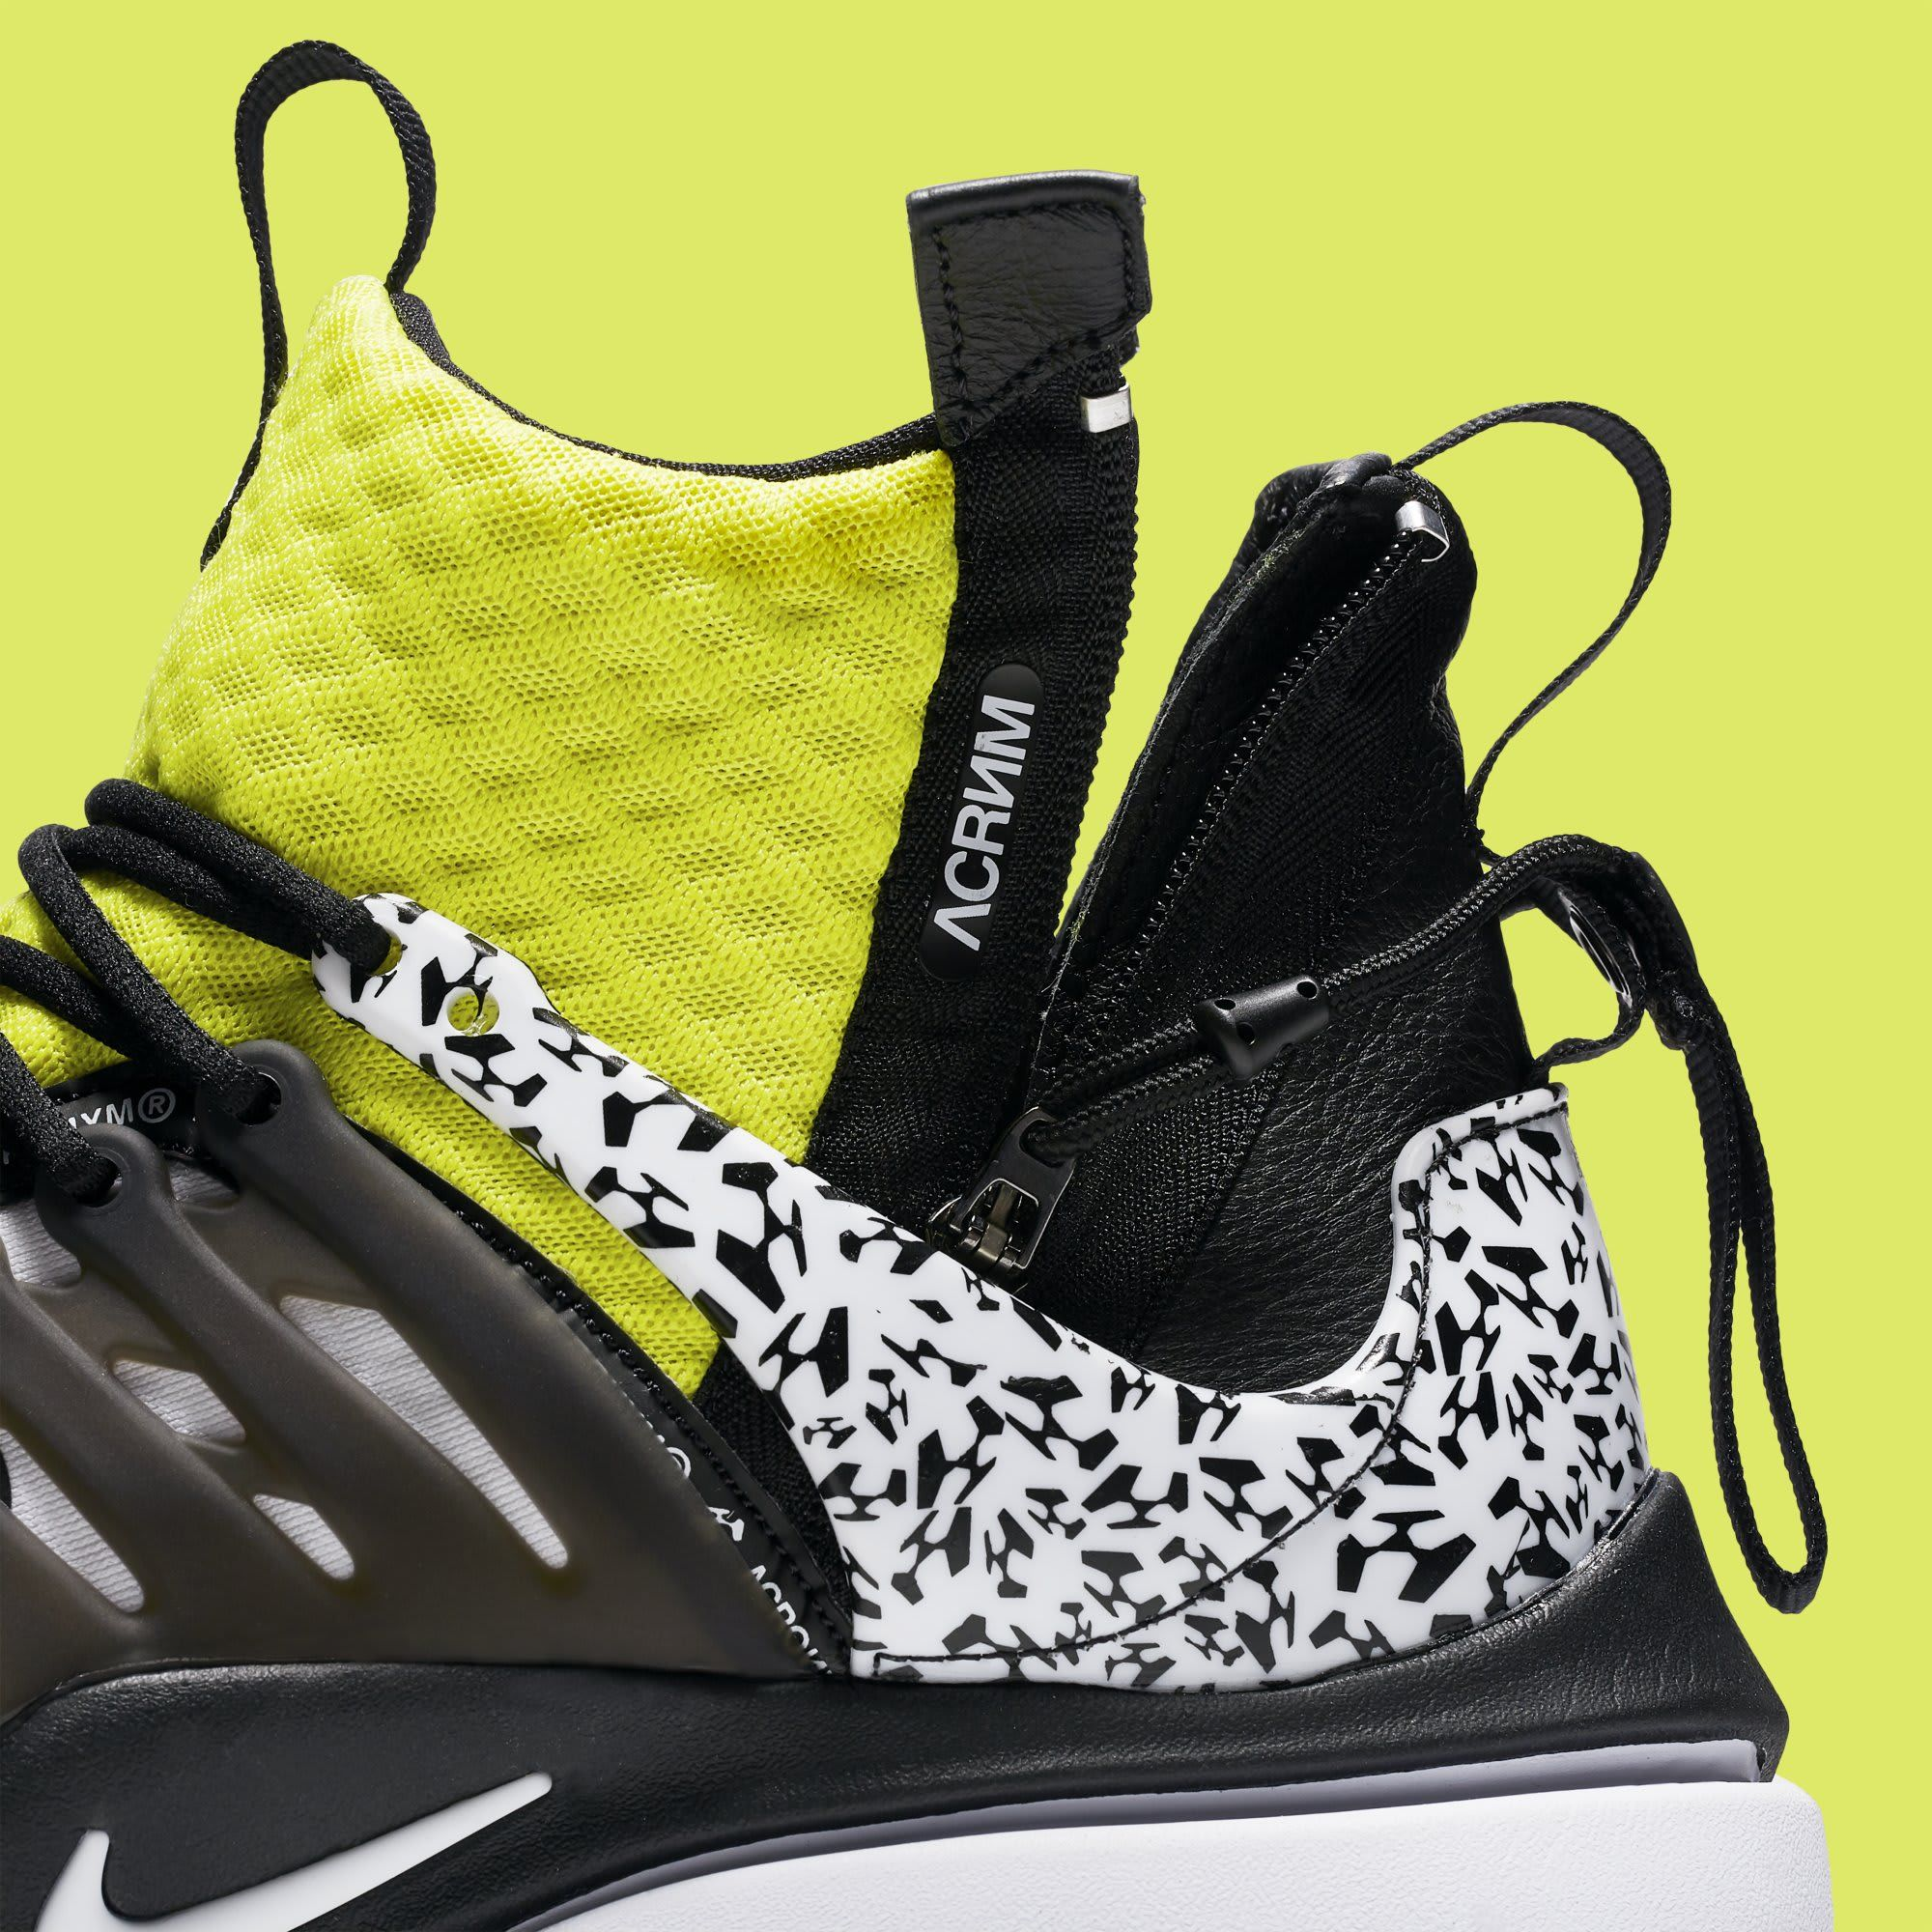 ba8d814fa23c Acronym x Nike Air Presto Mid  White Dynamic Yellow Black  AH7832-100  (Detail)